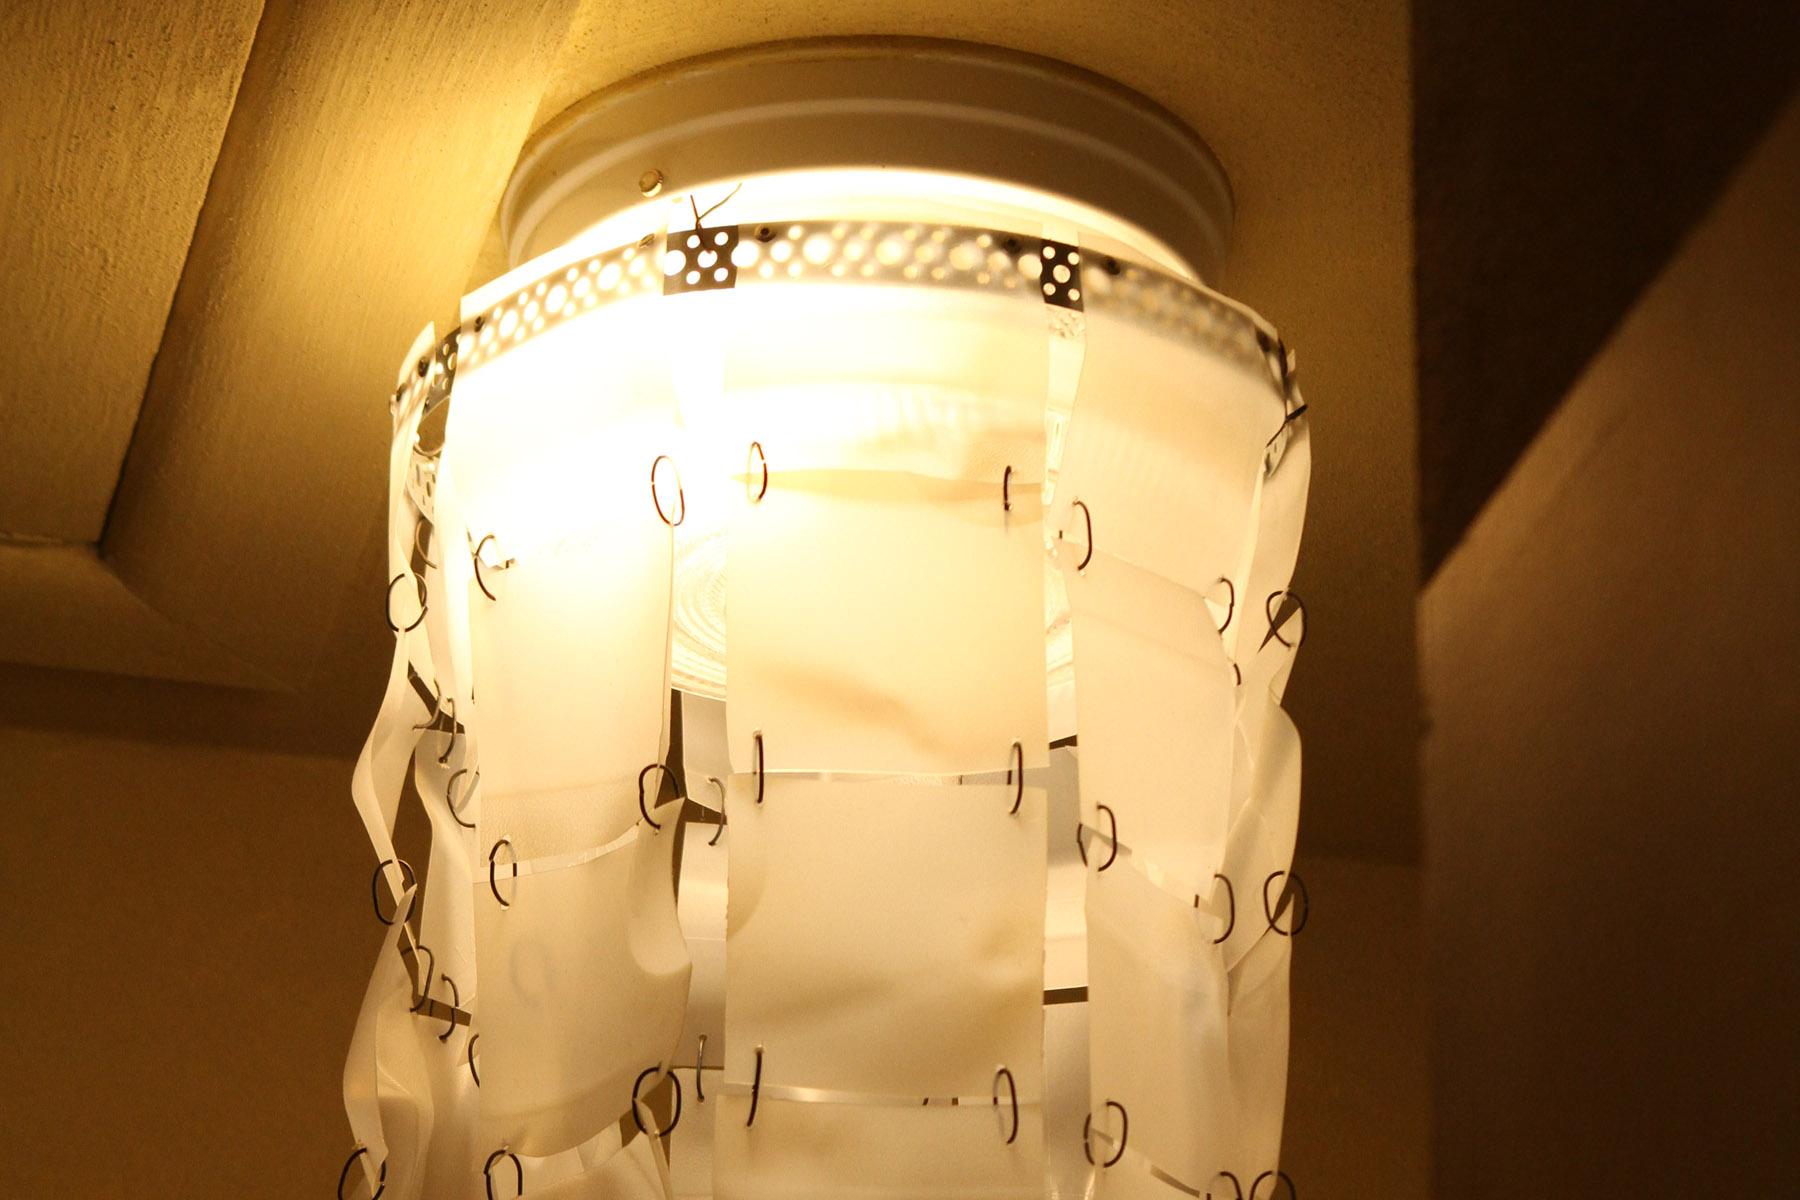 P4_58pieces of light_1.jpg